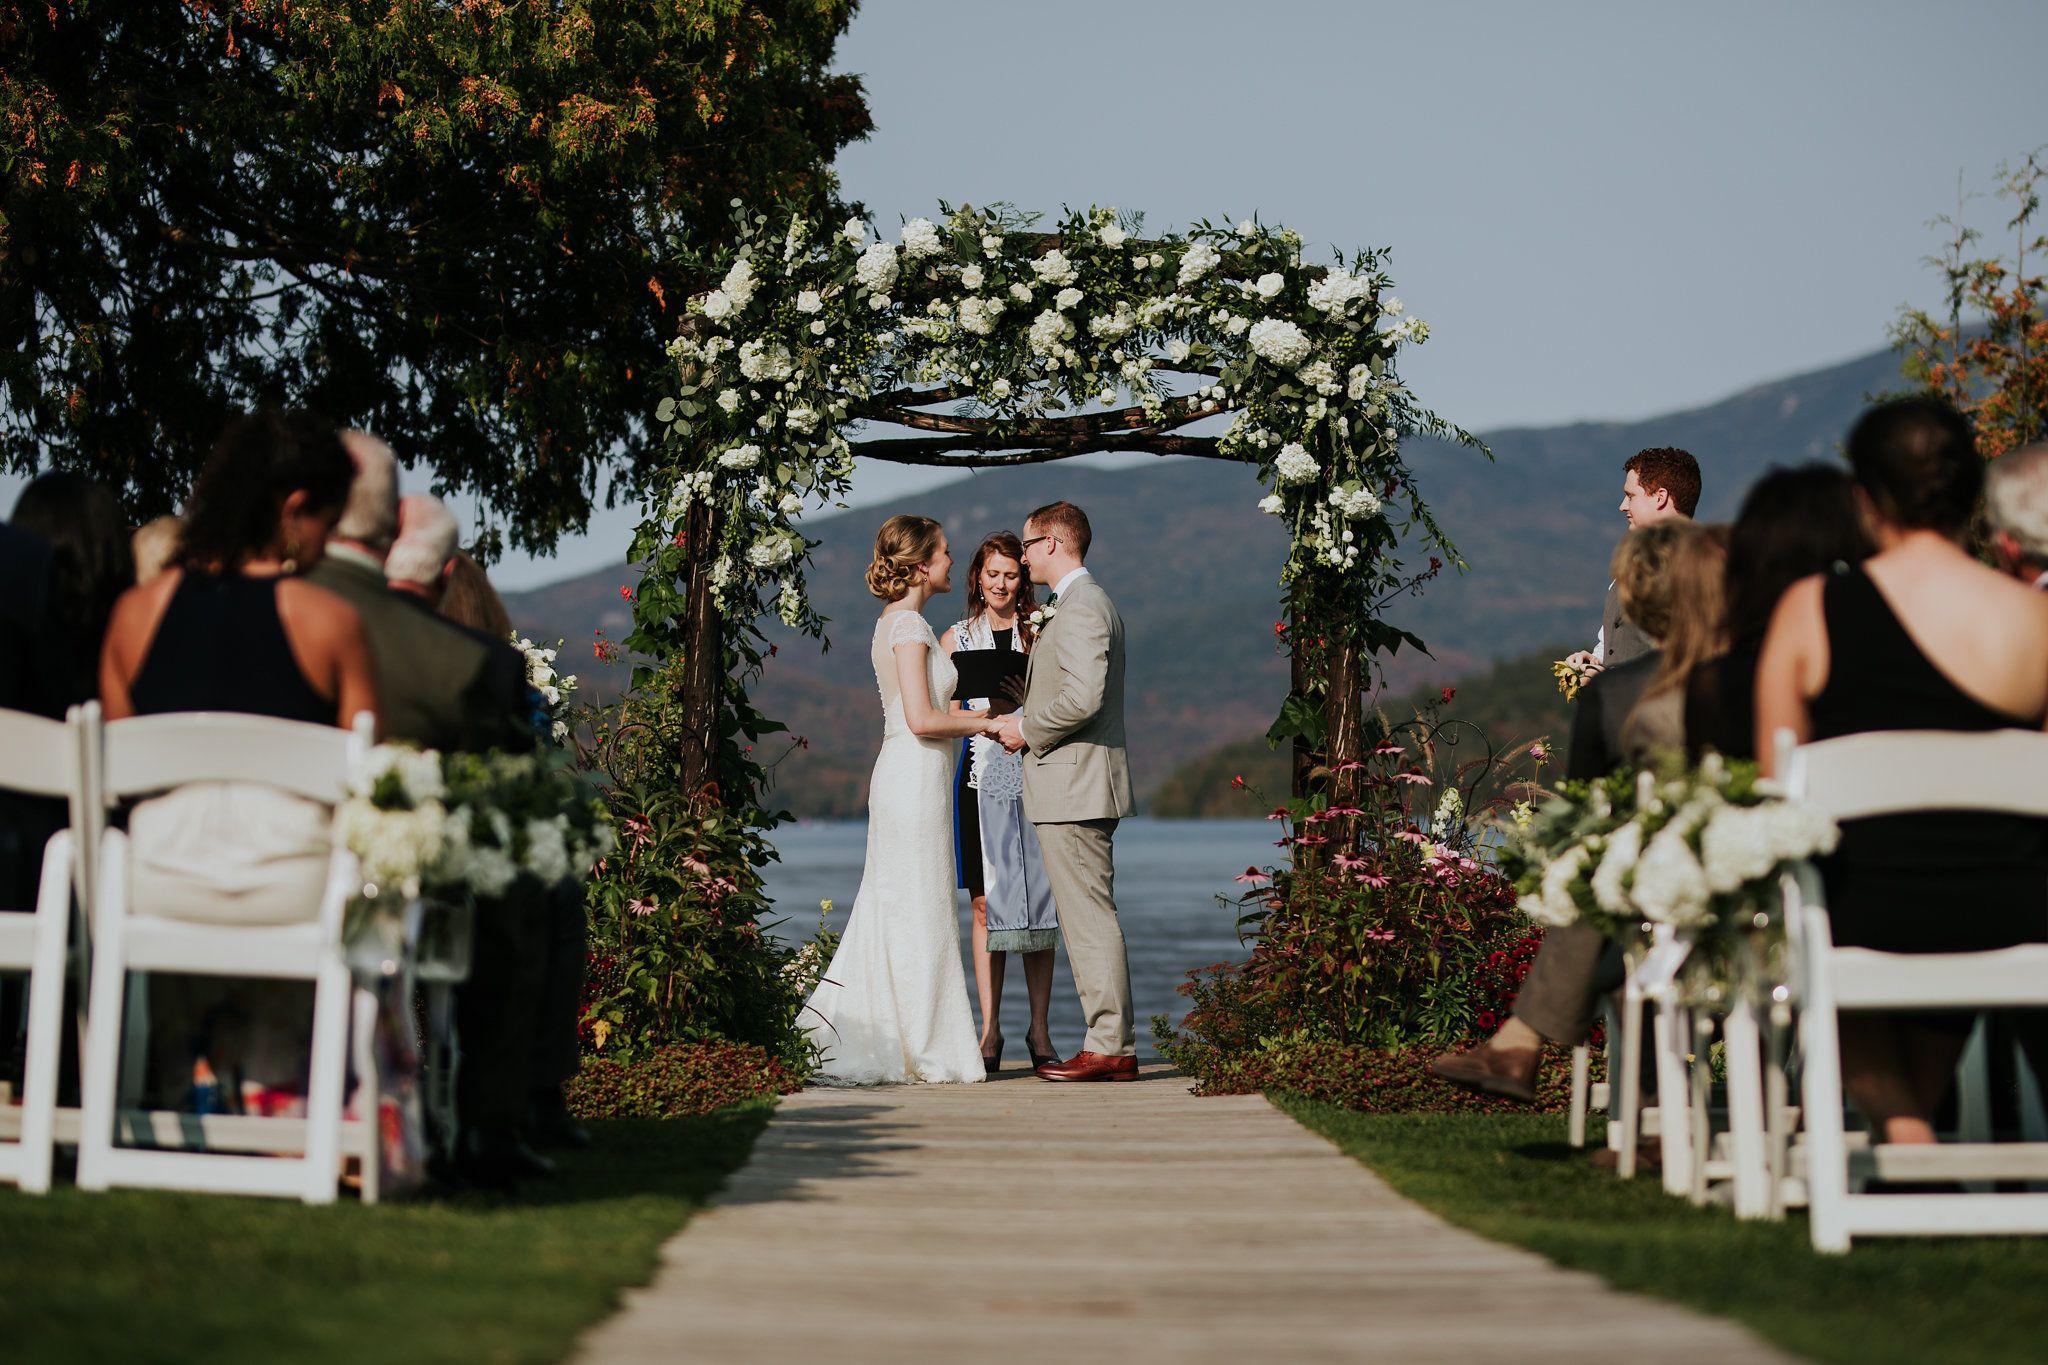 Adirondack wedding venue whiteface club resort lake